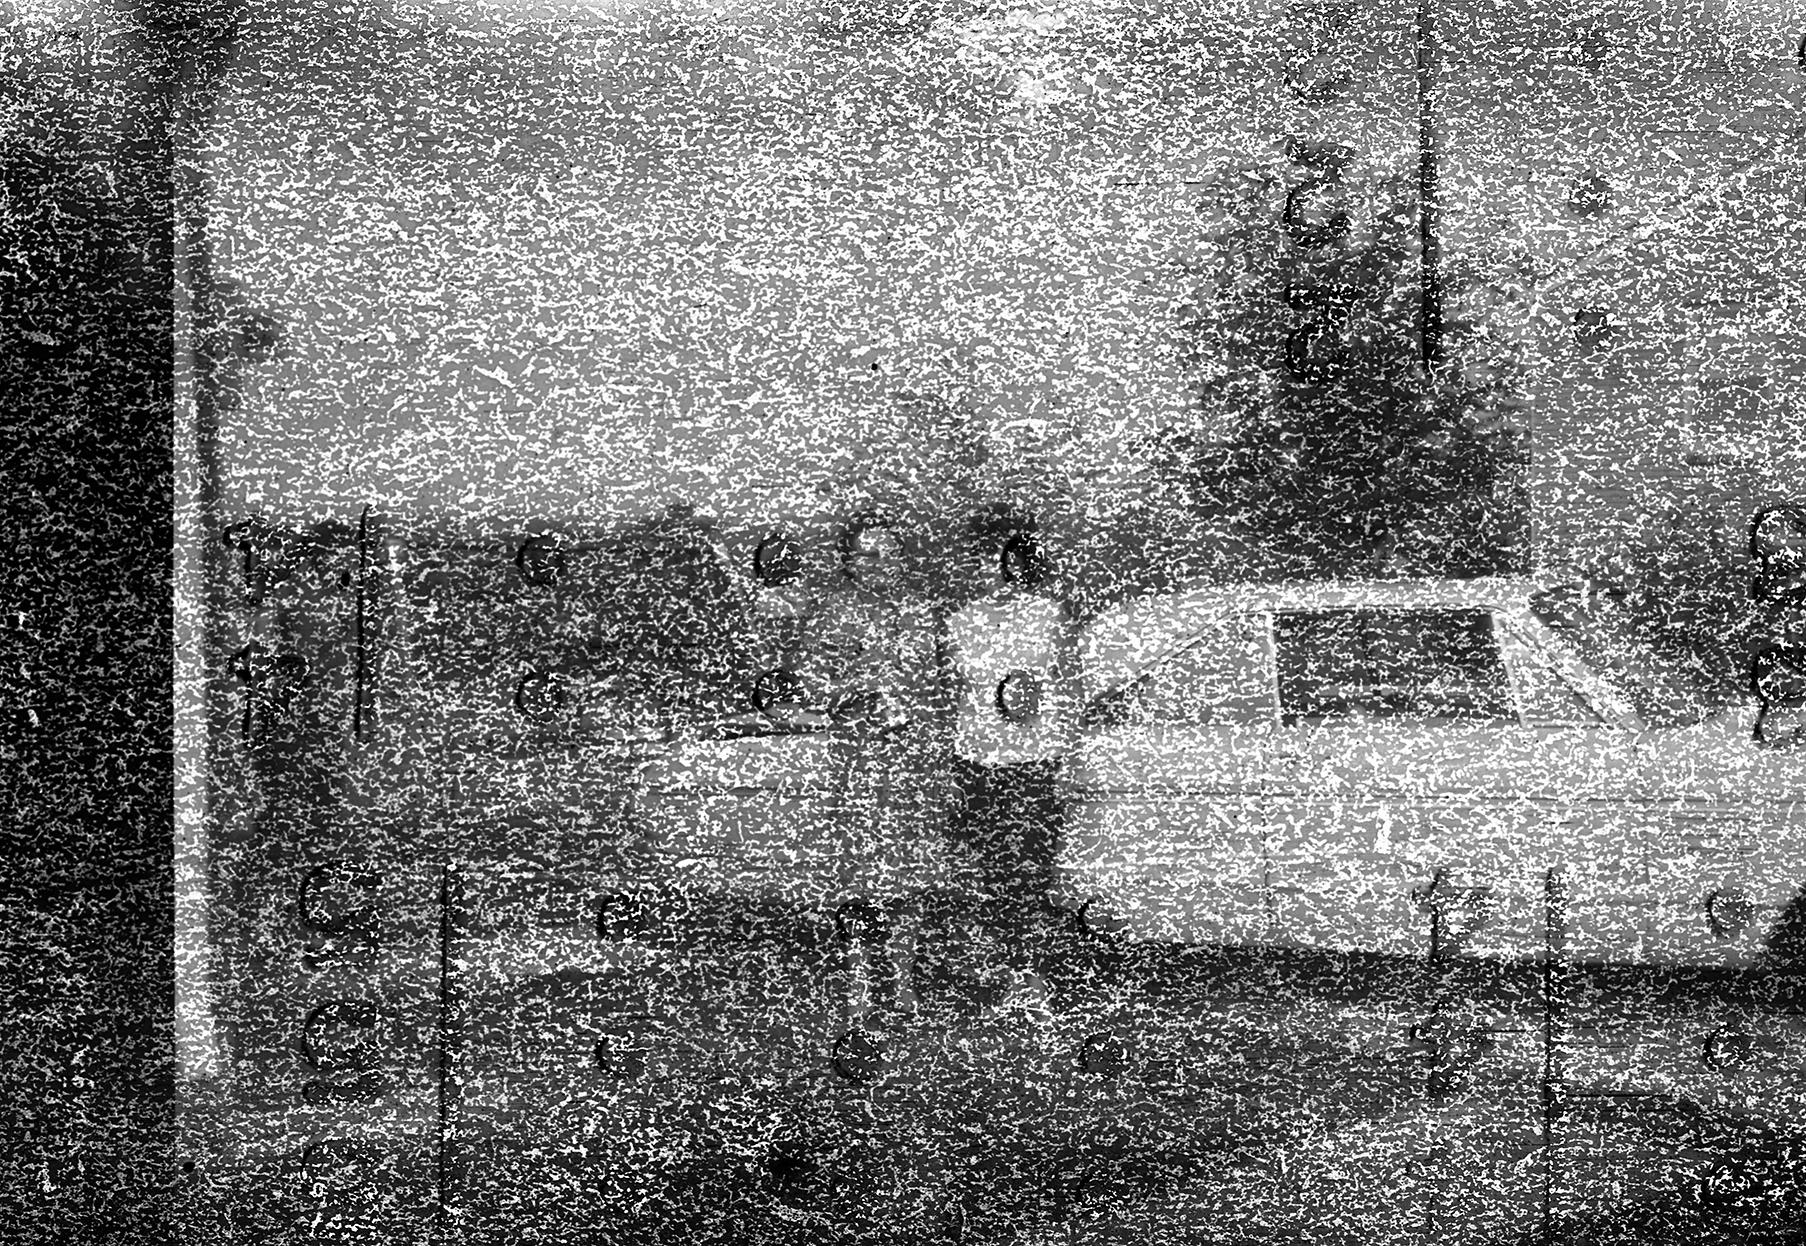 CA 7 002.jpg